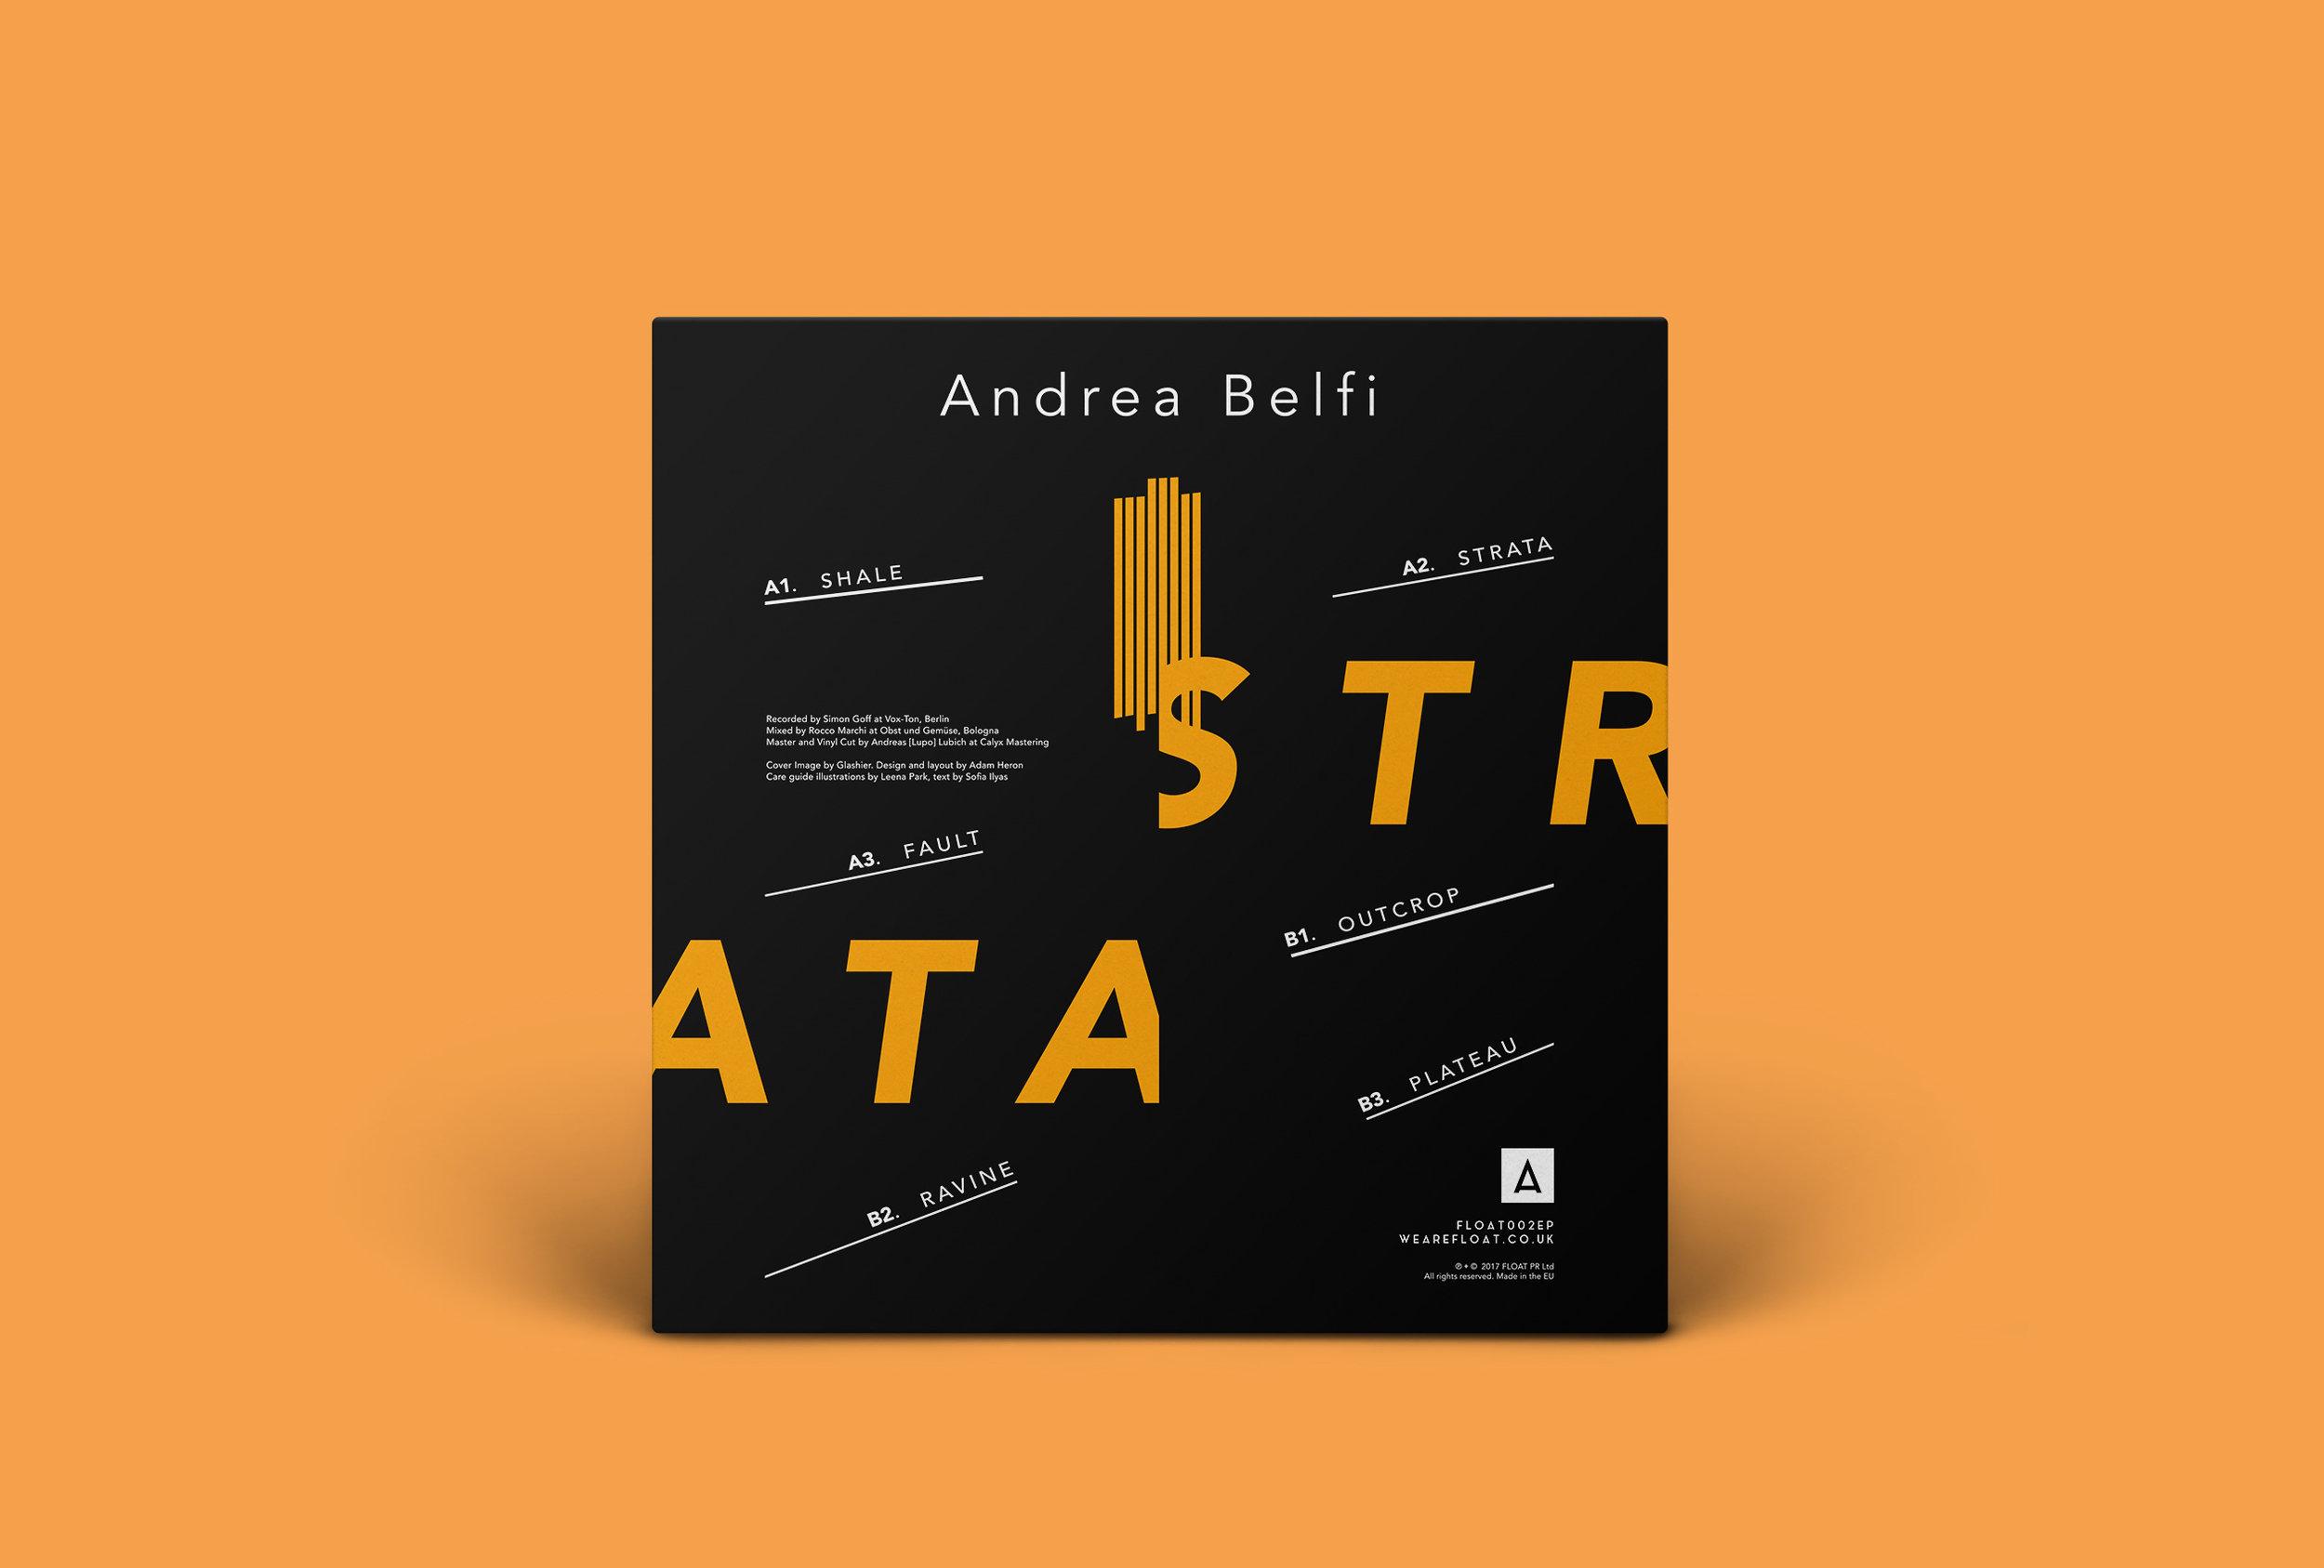 Andrea-Belfi_STRATA_vinyl-mock-up_back.jpg